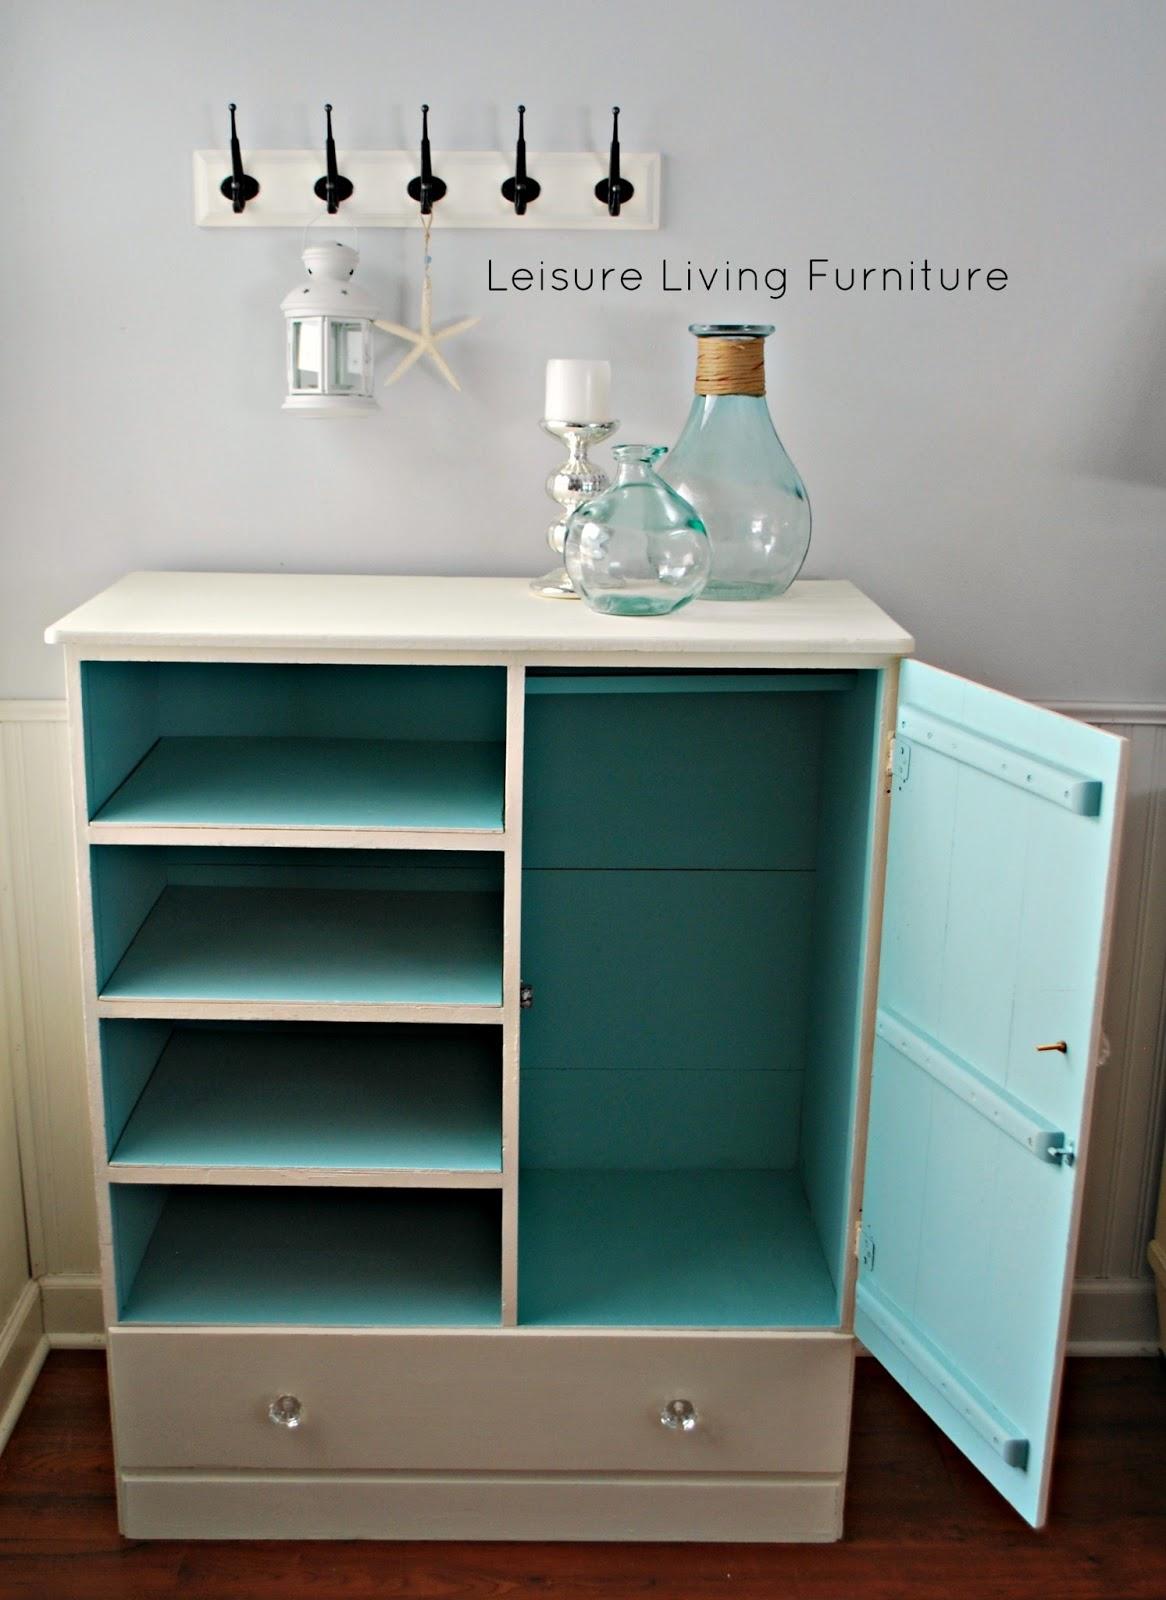 Leisure Living Bathroom Storage Cabinet